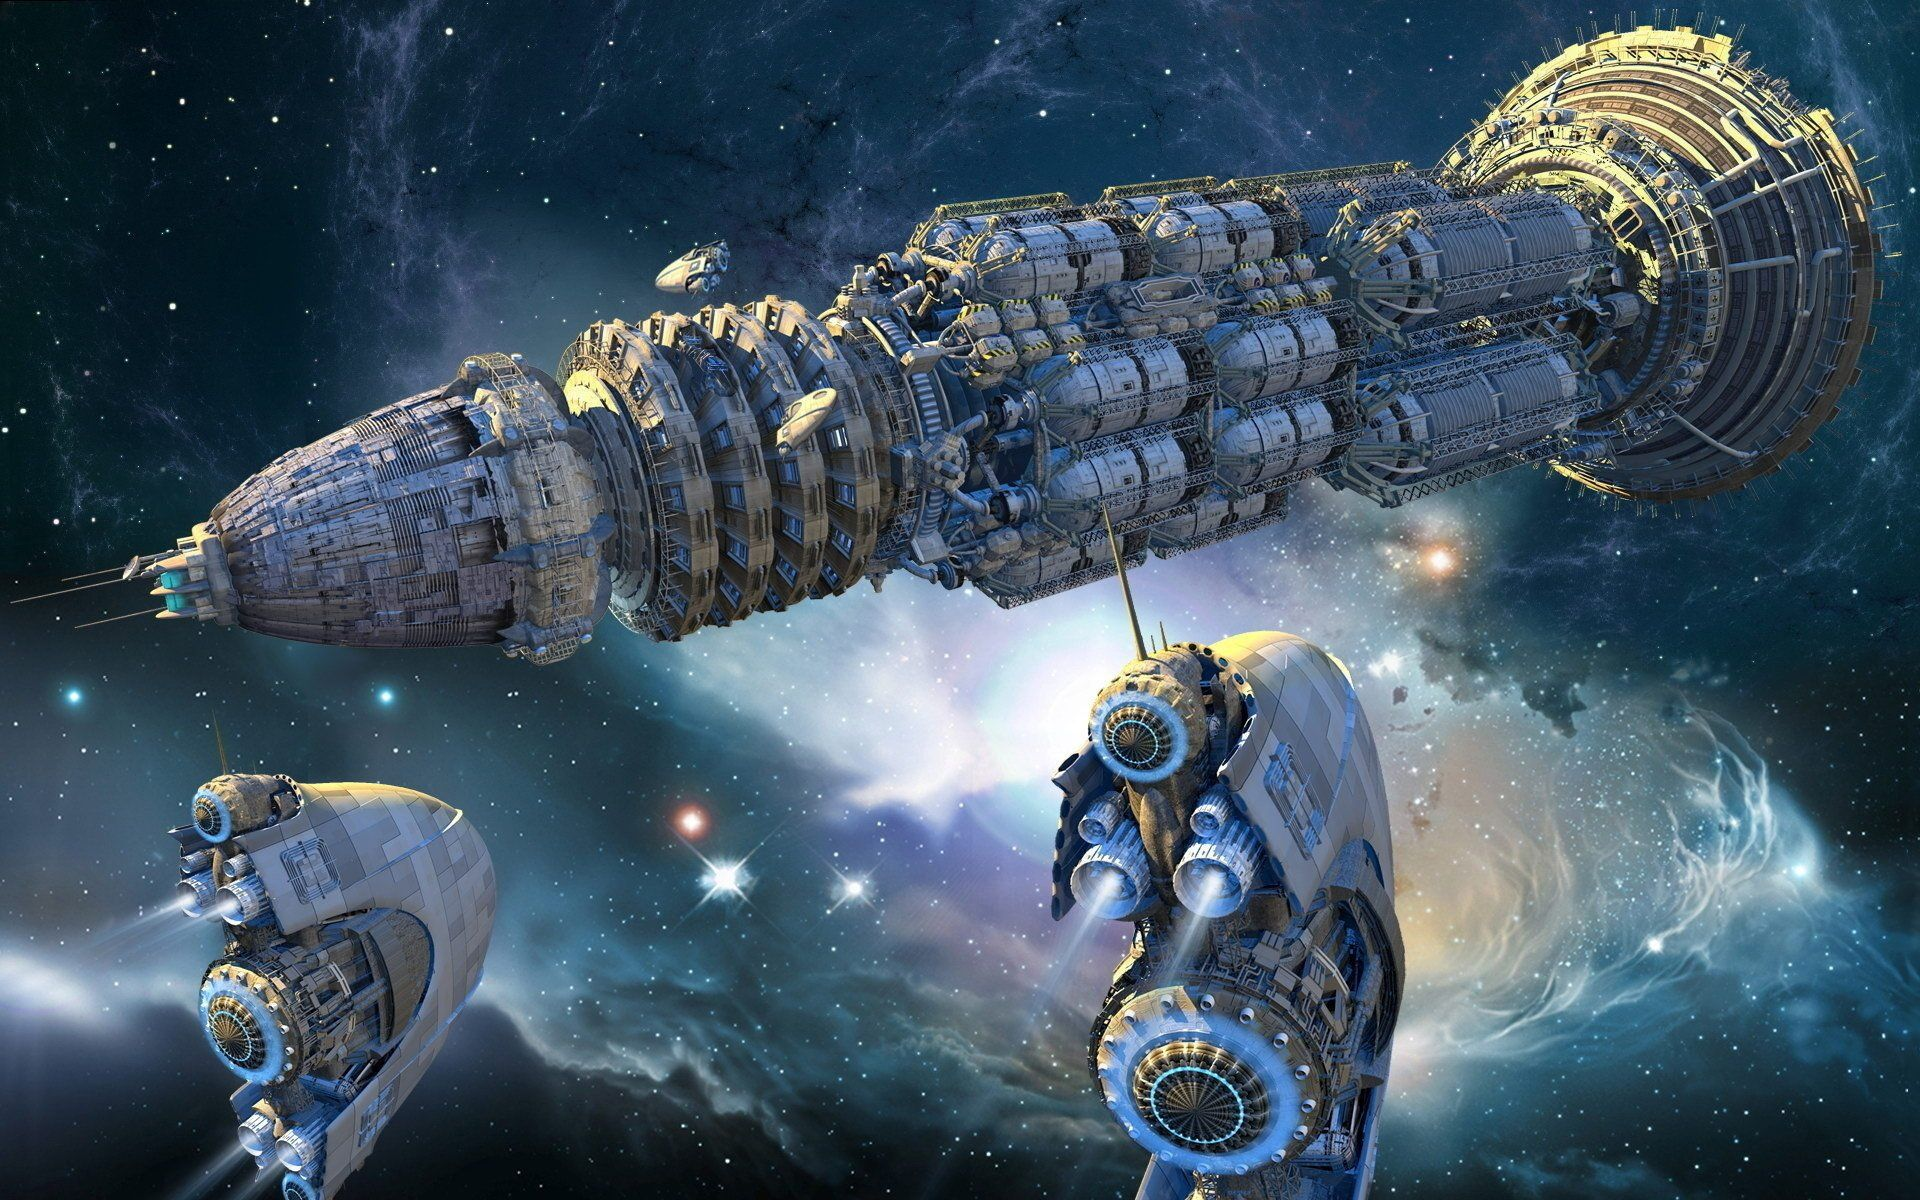 1032 Nave Espacial Fondos De Pantalla HD